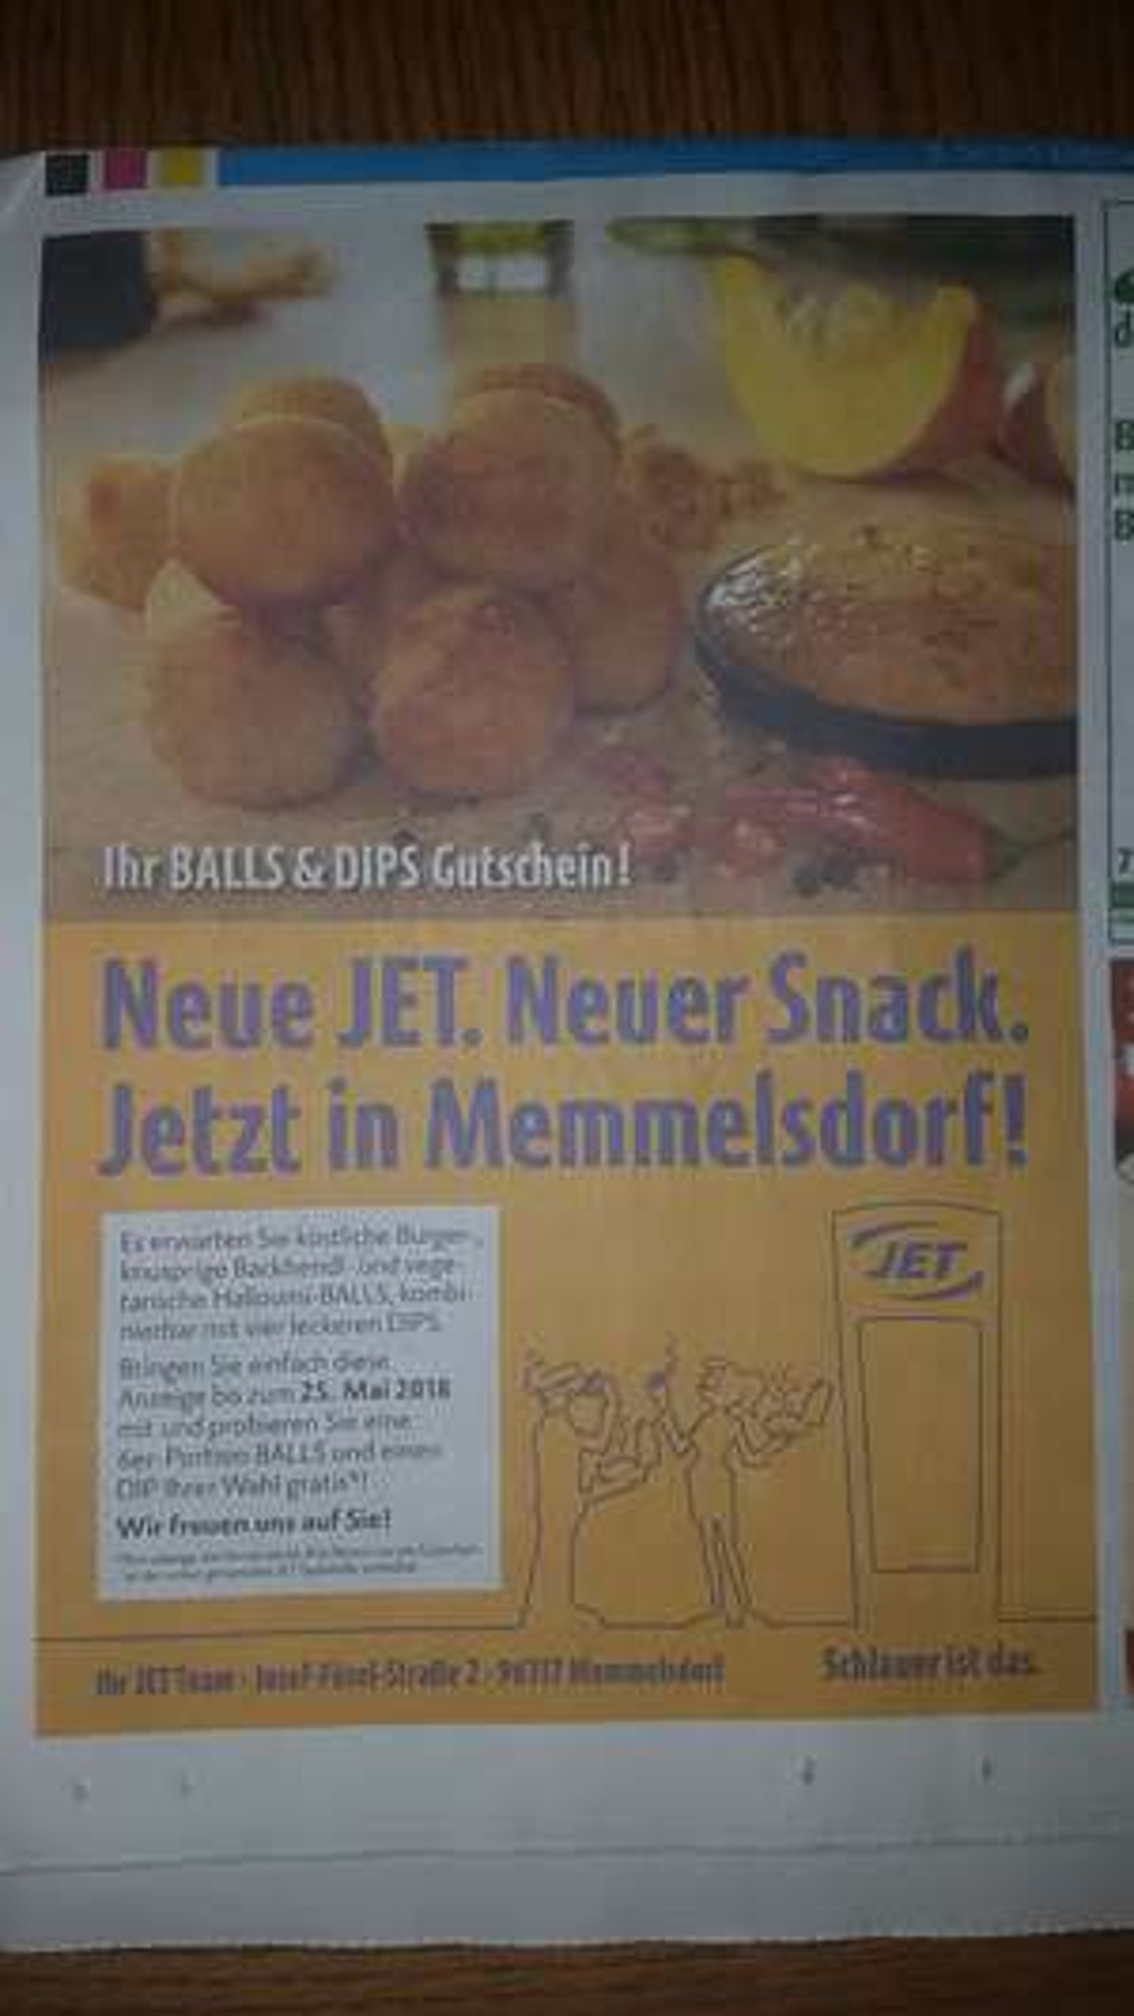 JET Tankstelle - BALLS & DIPS Gutschein - Memmelsdorf / Landkreis Bamberg